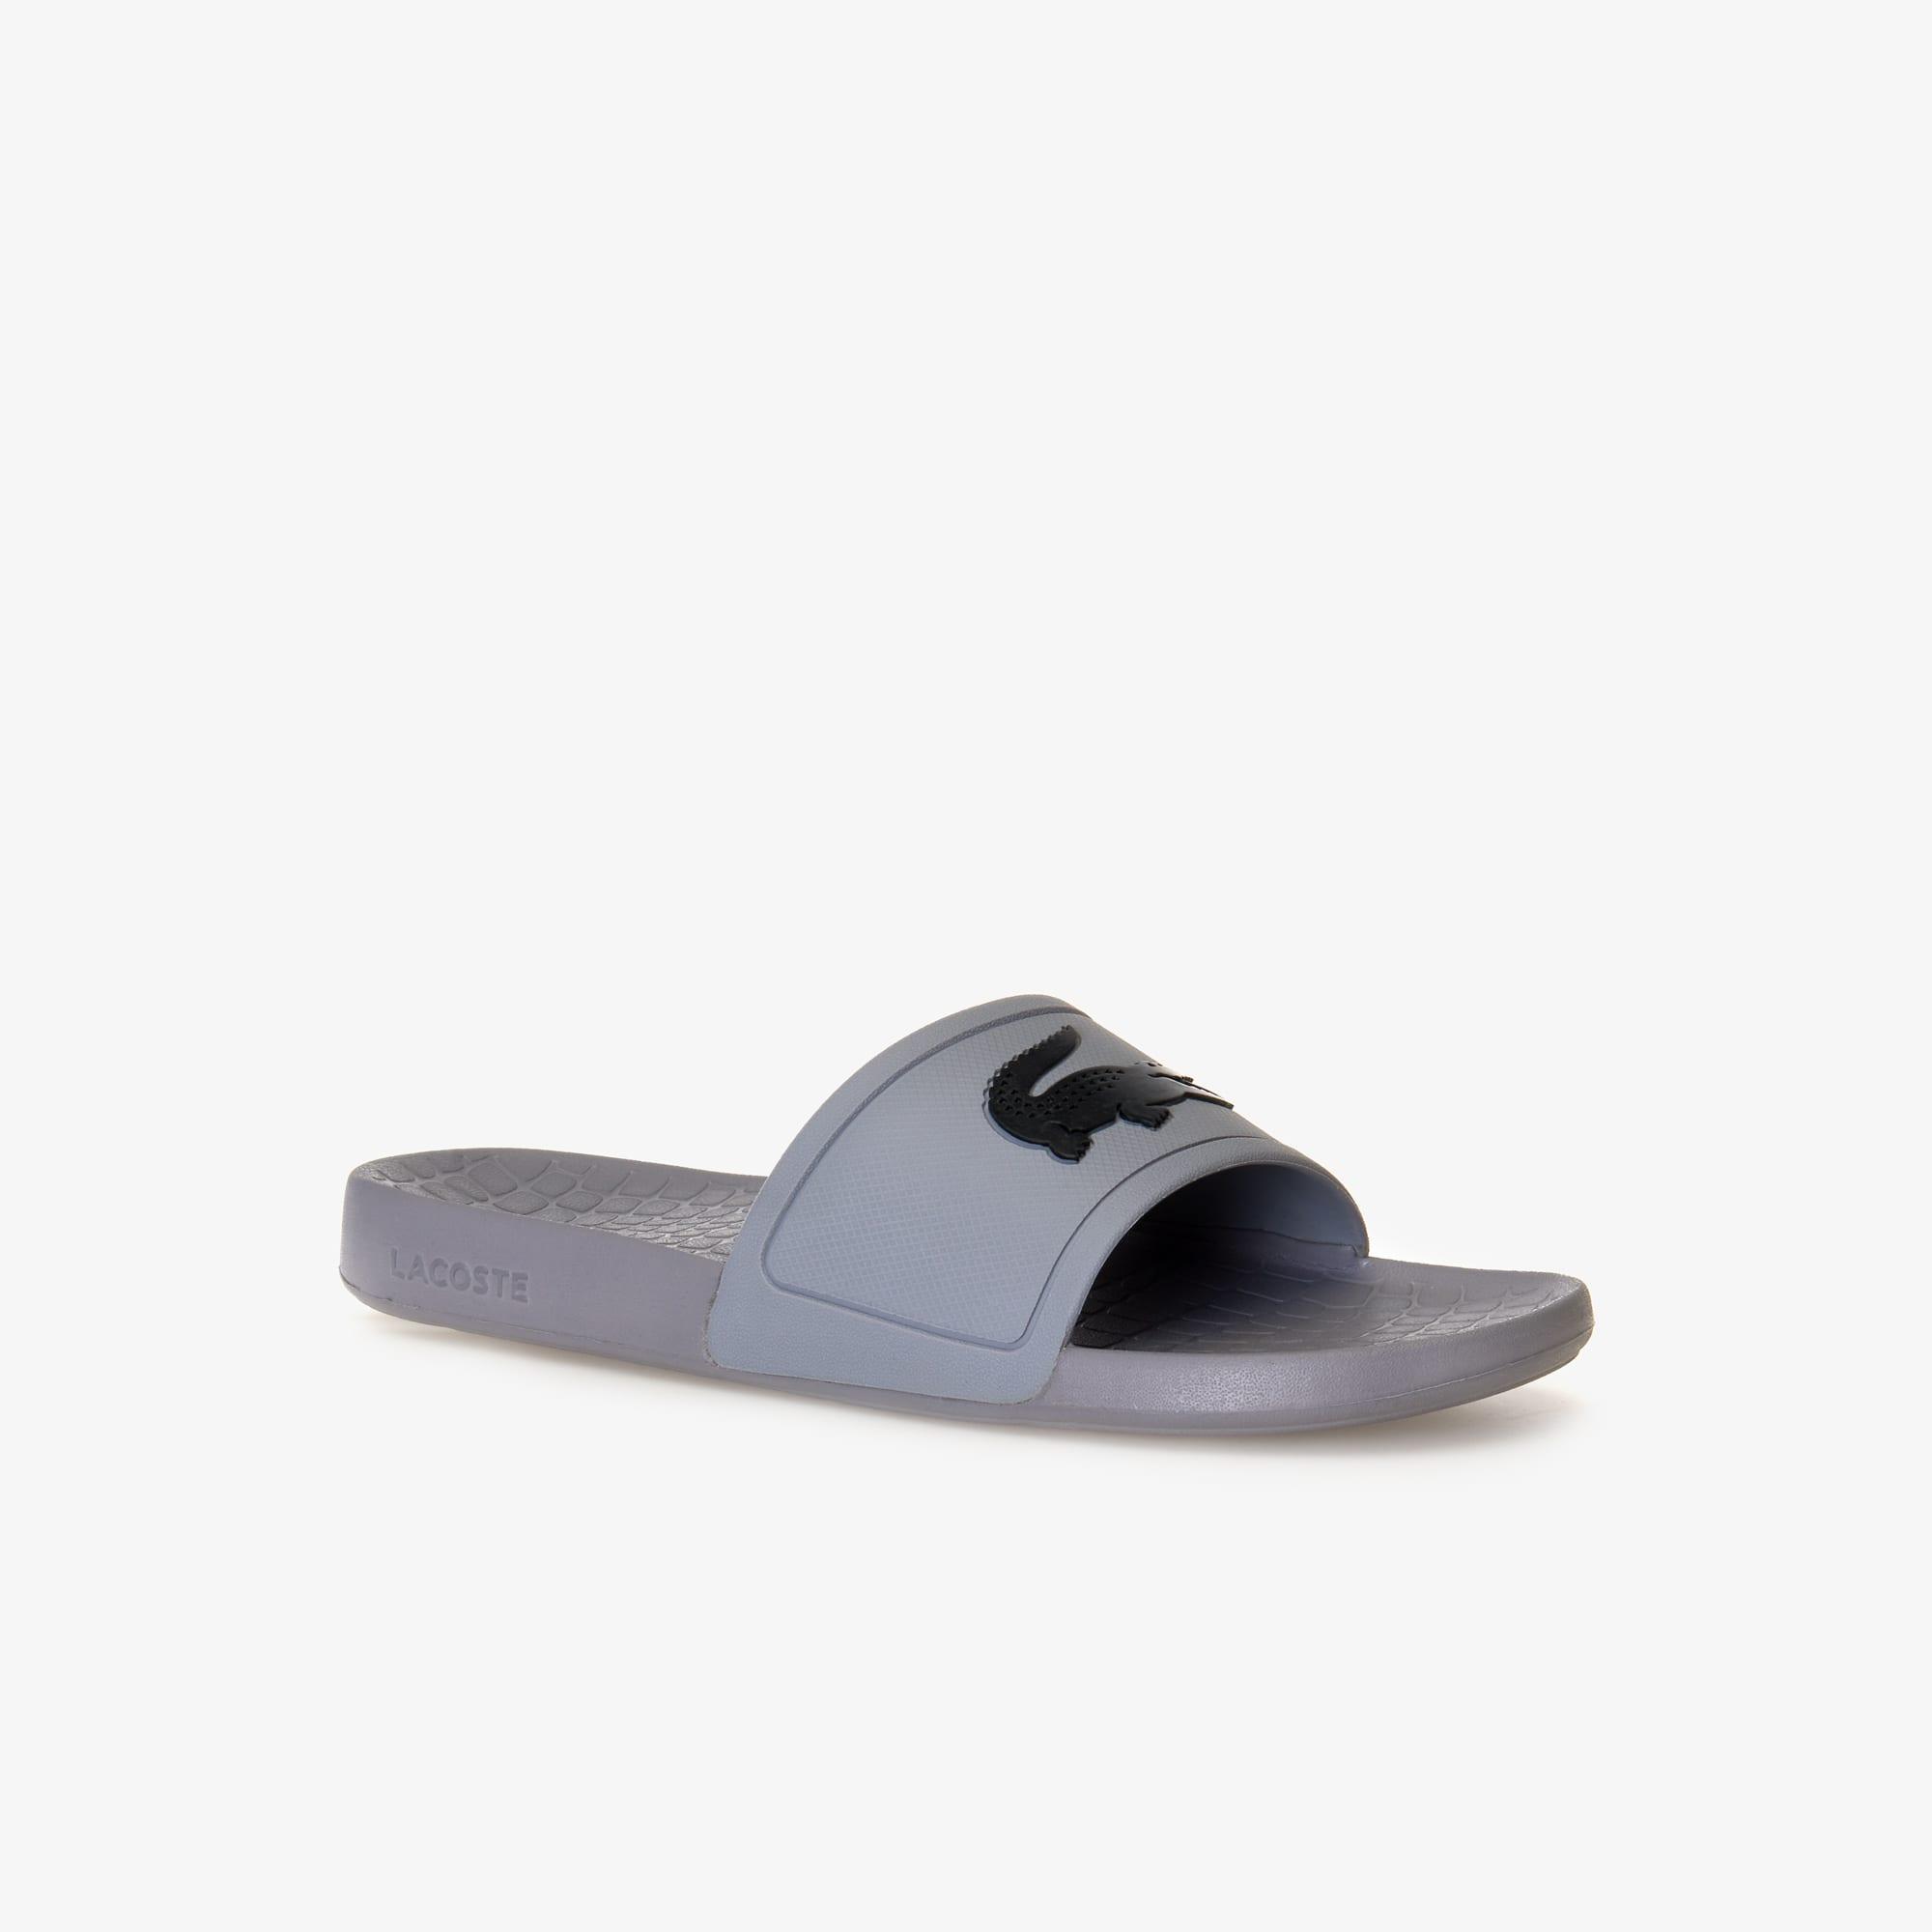 2ae02f4cf Men s Shoes